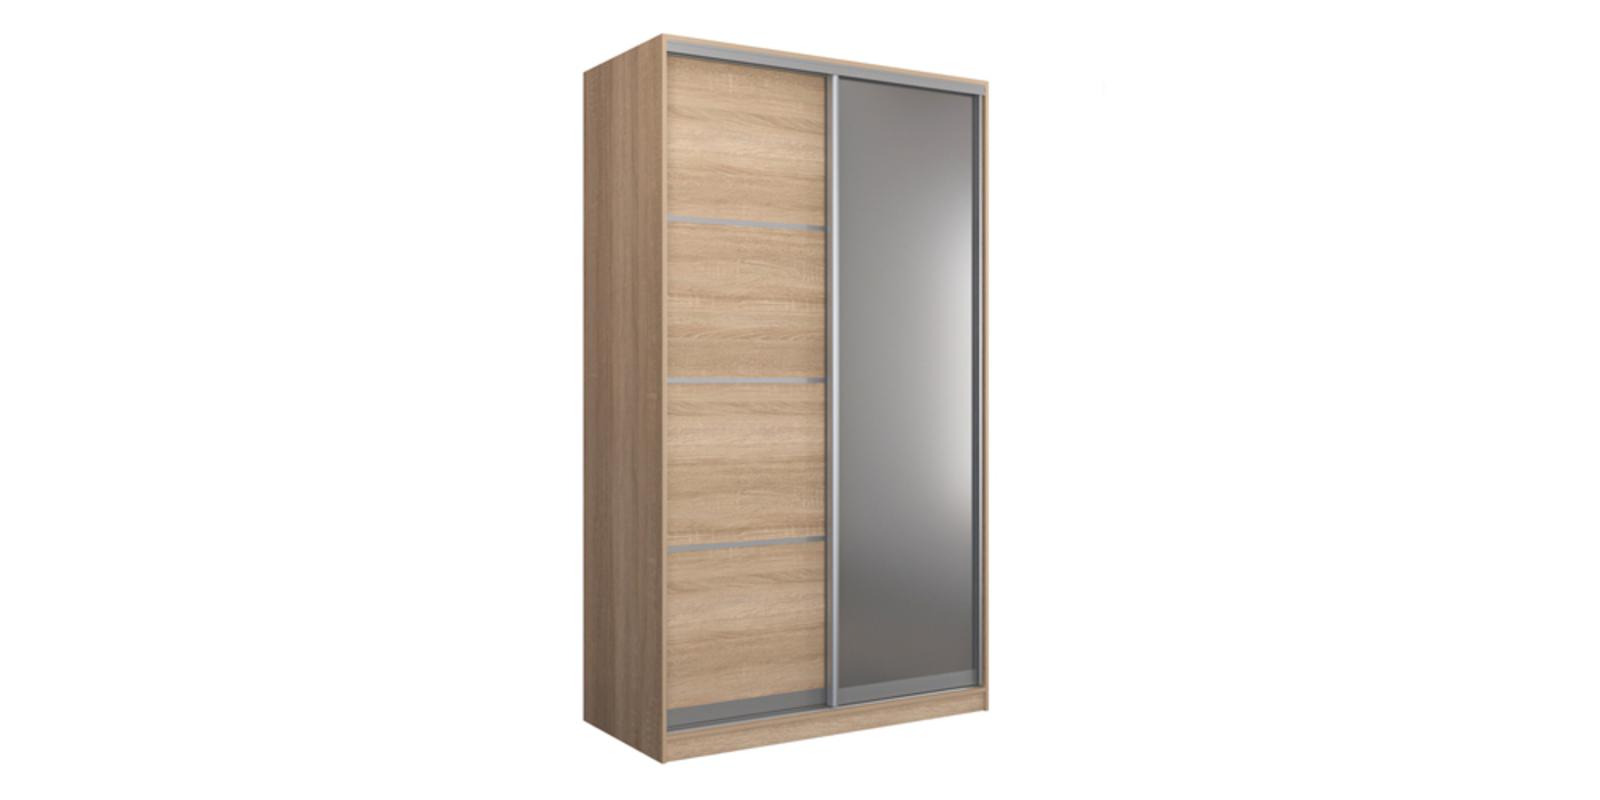 Шкаф-купе двухдверный Манхеттен 140 см (сонома+зеркало)